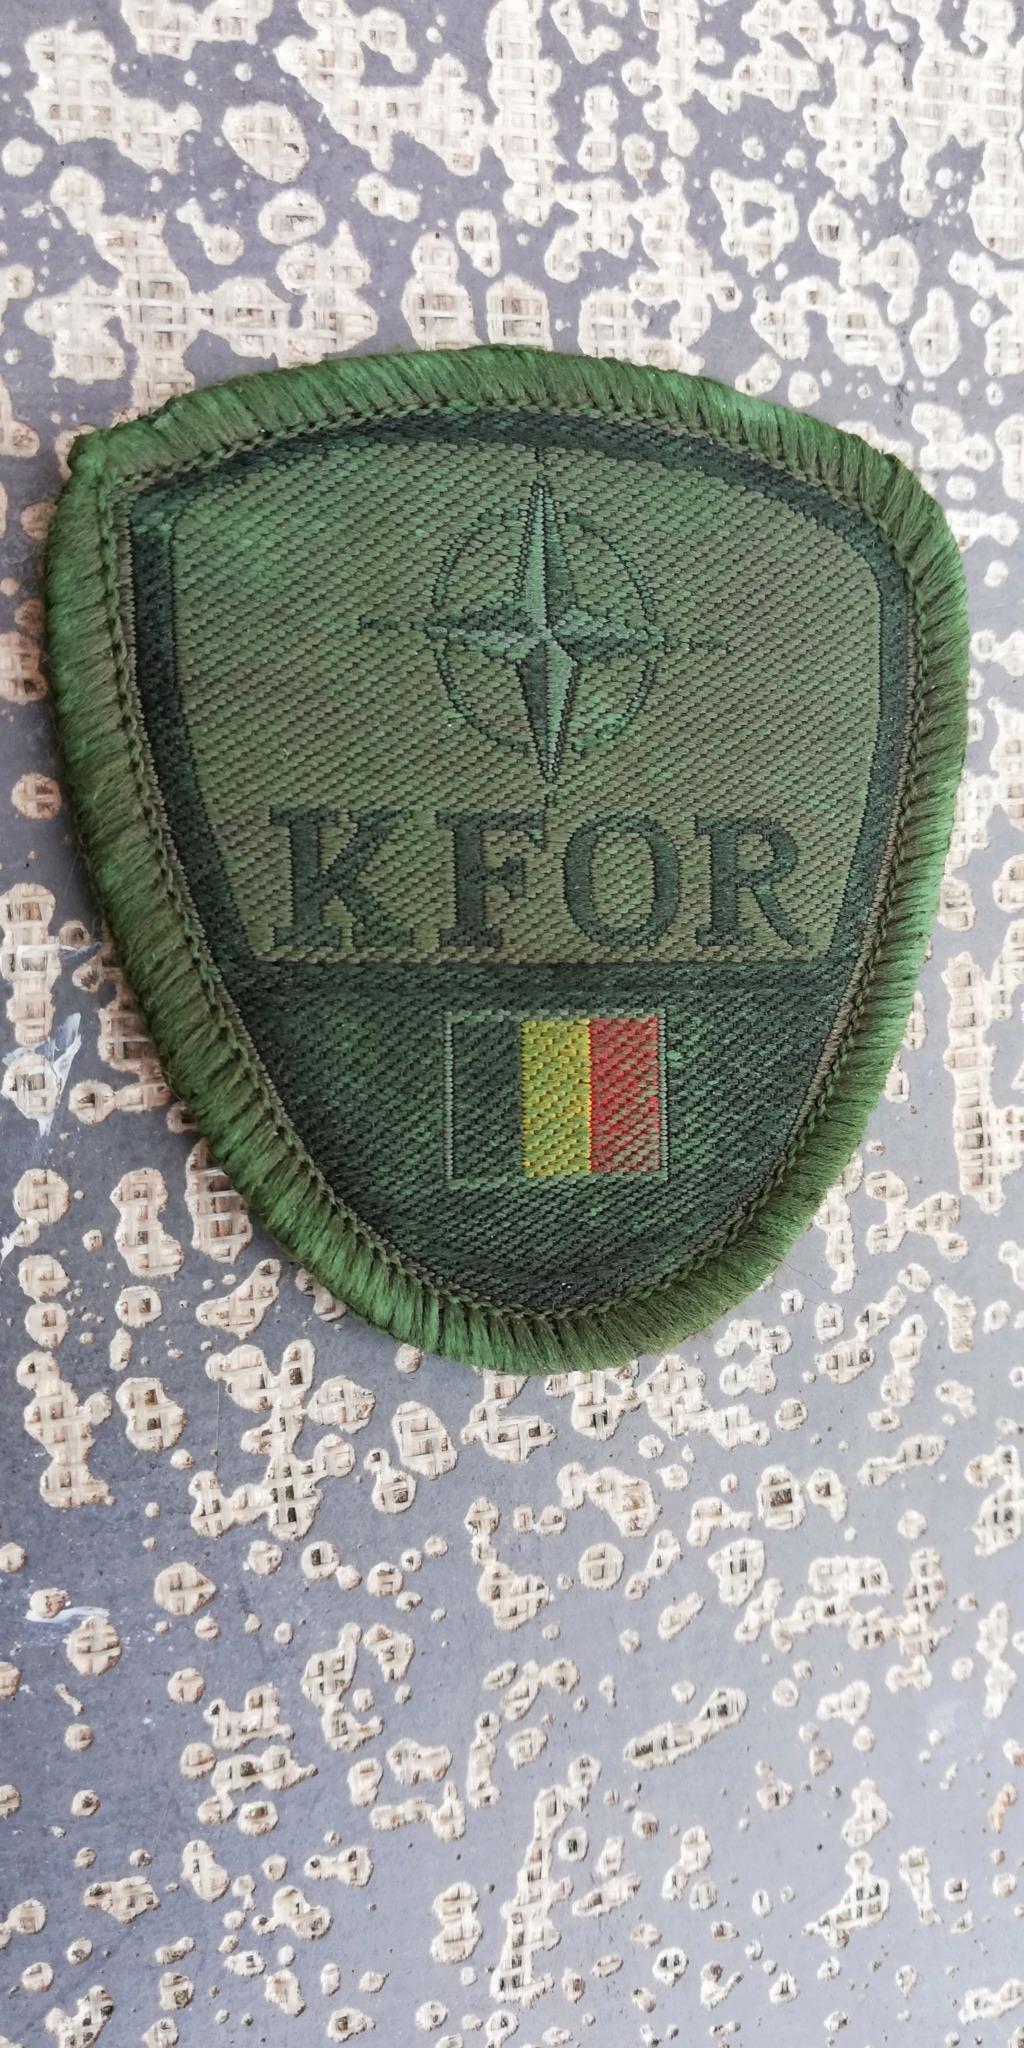 INSIGNES BELGES * MISSION EXTERIEURE OTAN ISAF ONU KFOR ISFOR SFOR ... Img_2286